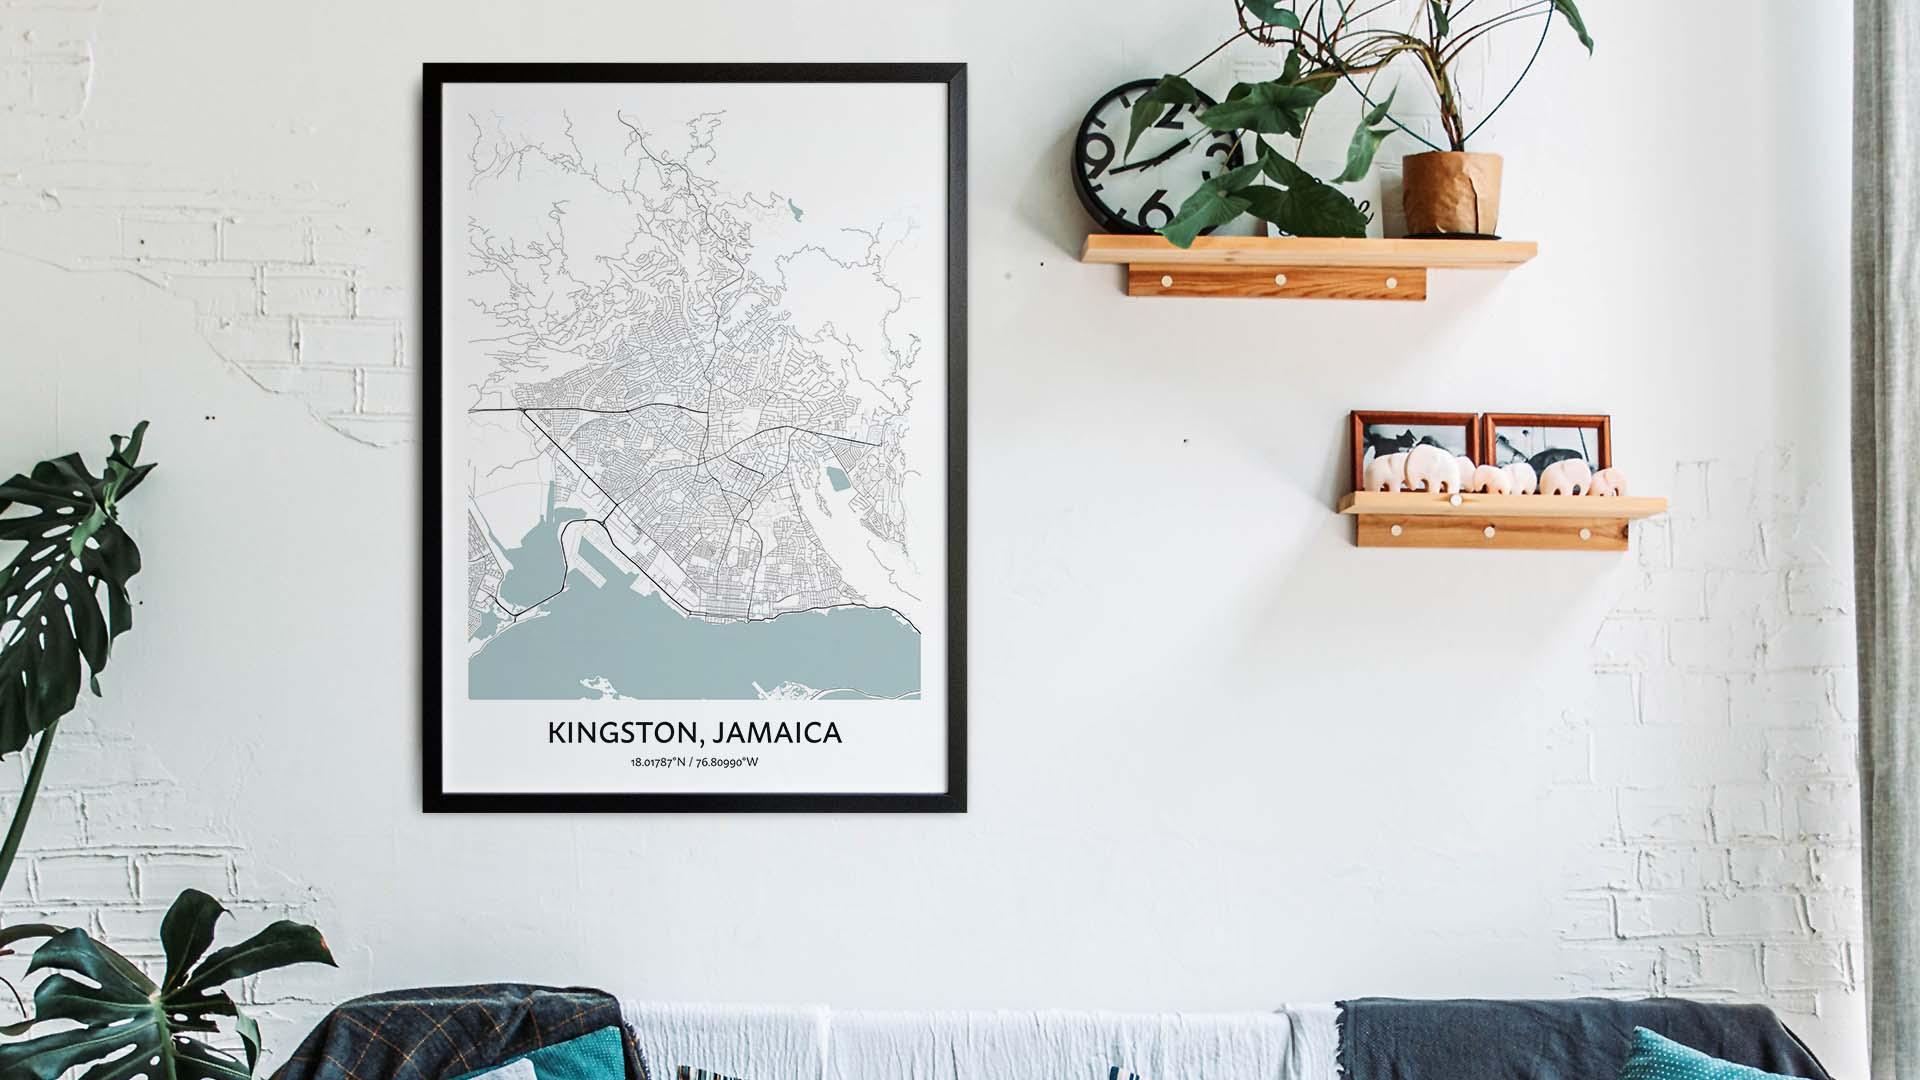 Kingston Jamaica map art